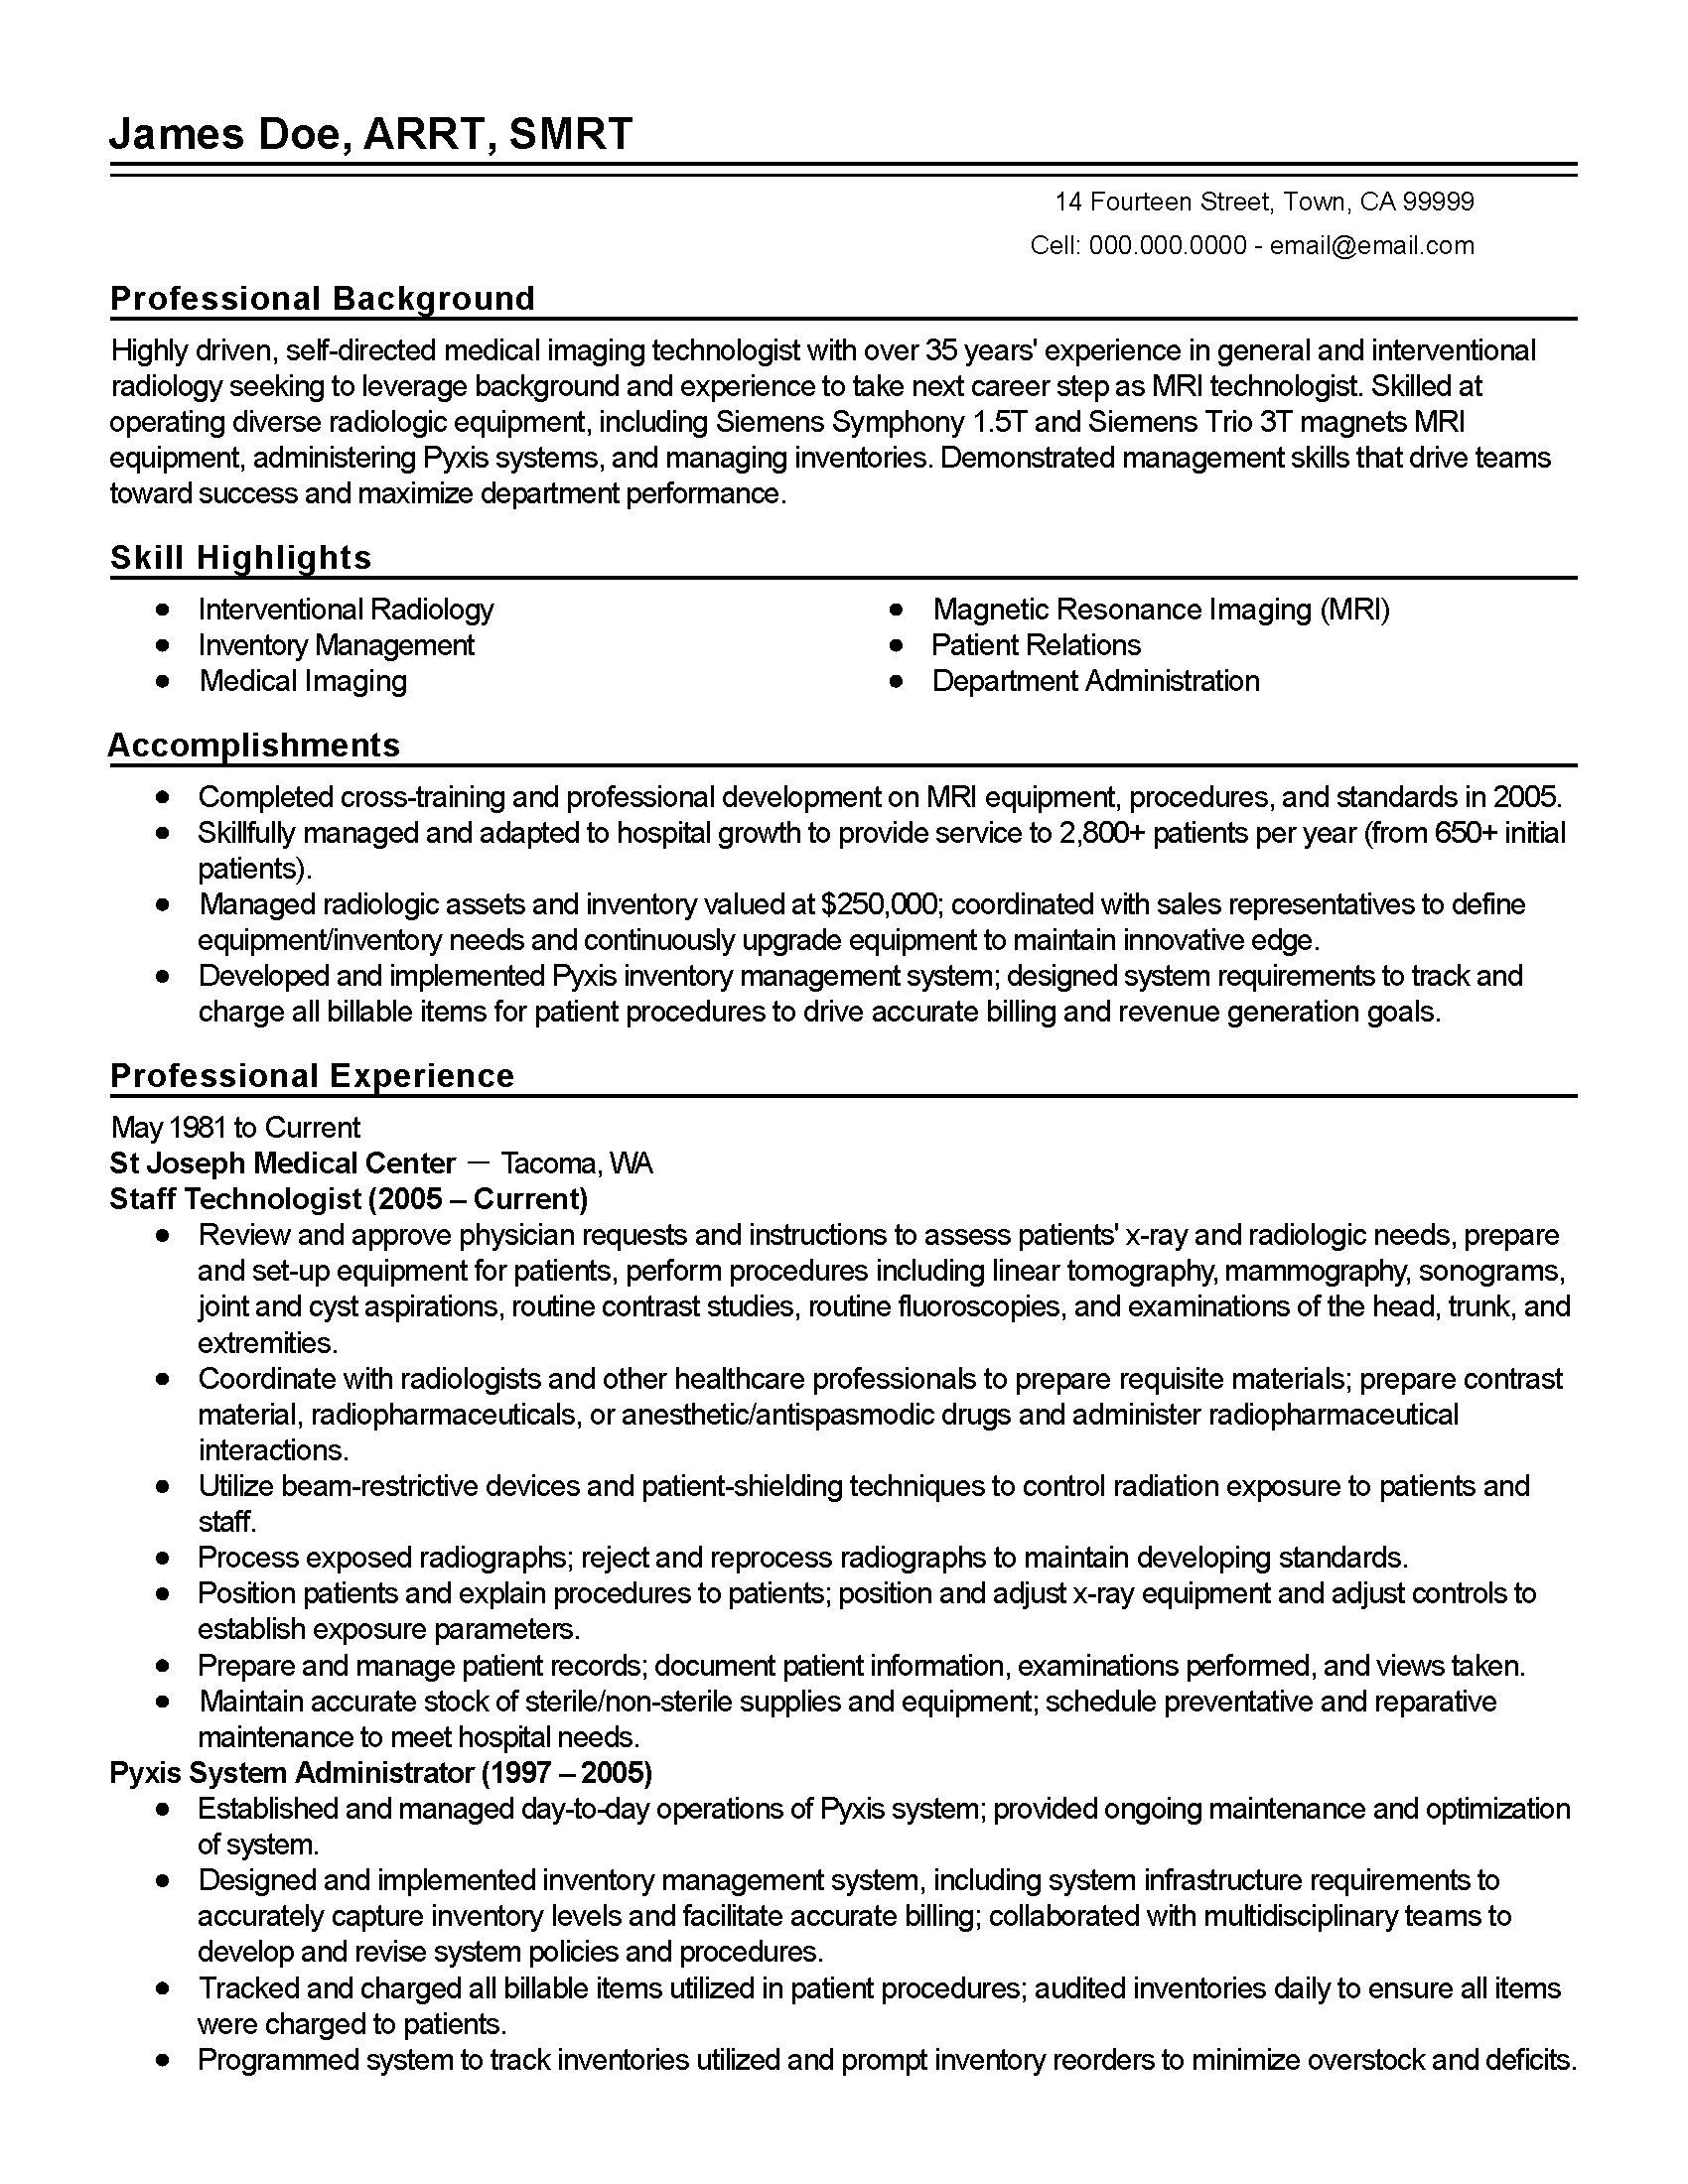 Resume Templates: Medical Imaging Technician